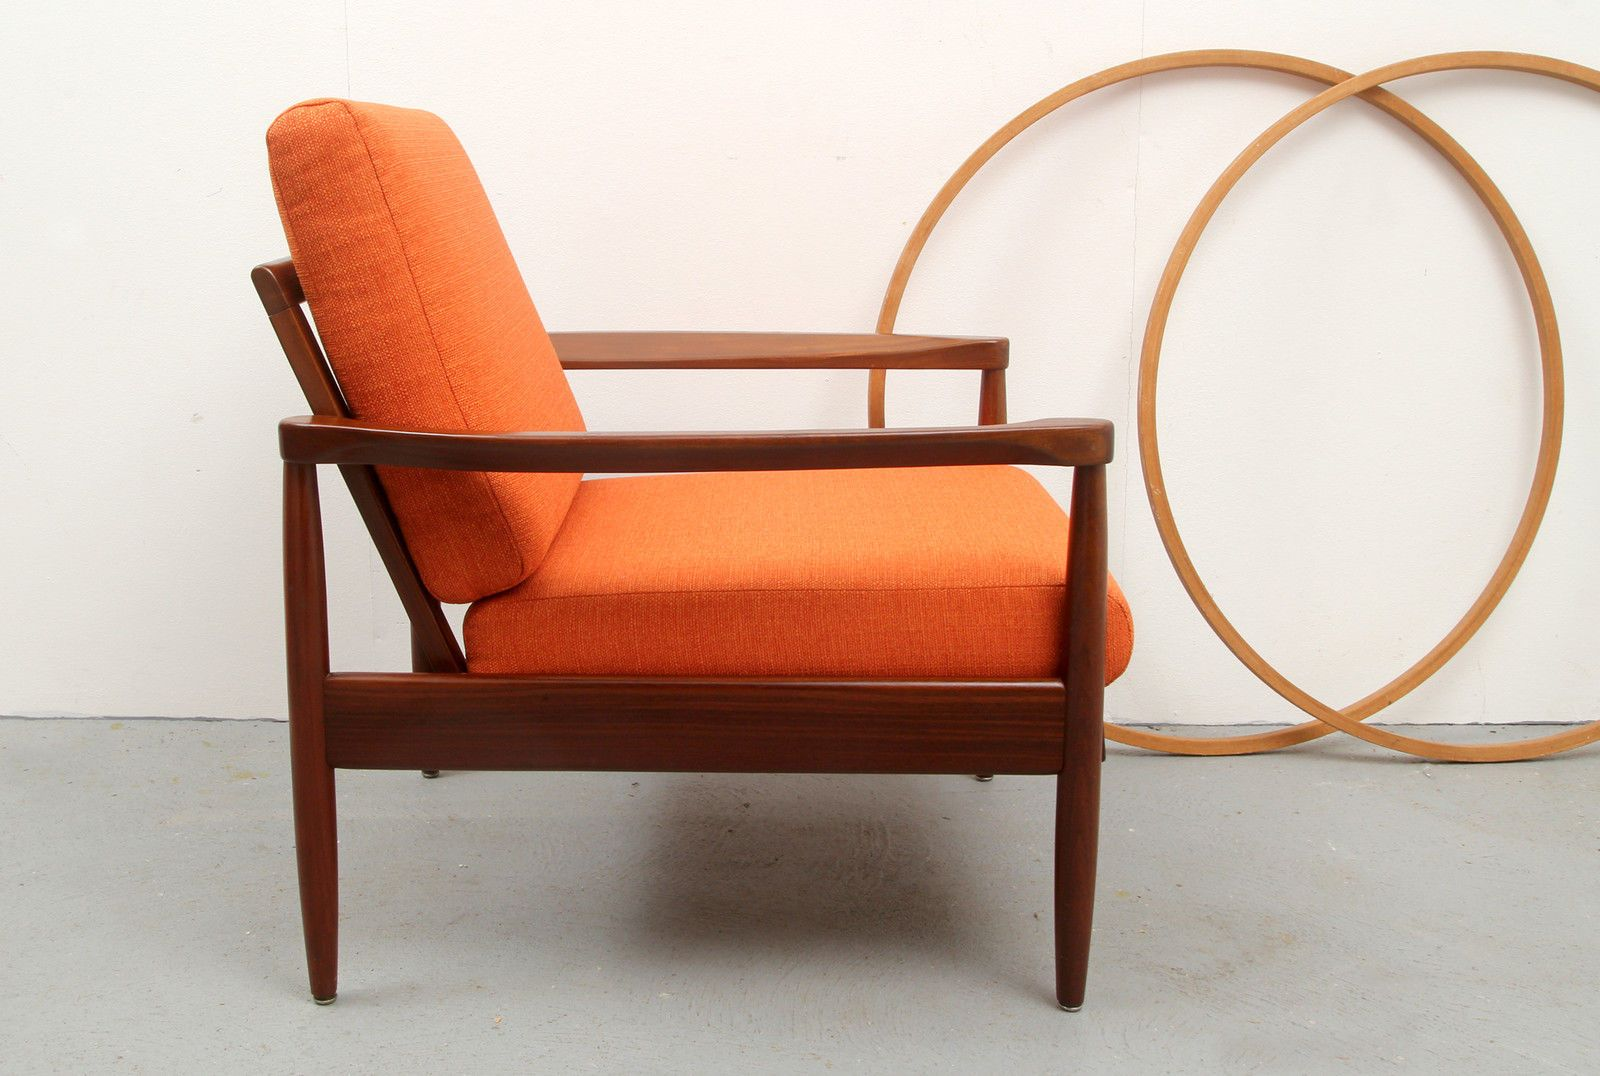 Scandinavian Style Teak Armchair, 1960s for sale at Pamono